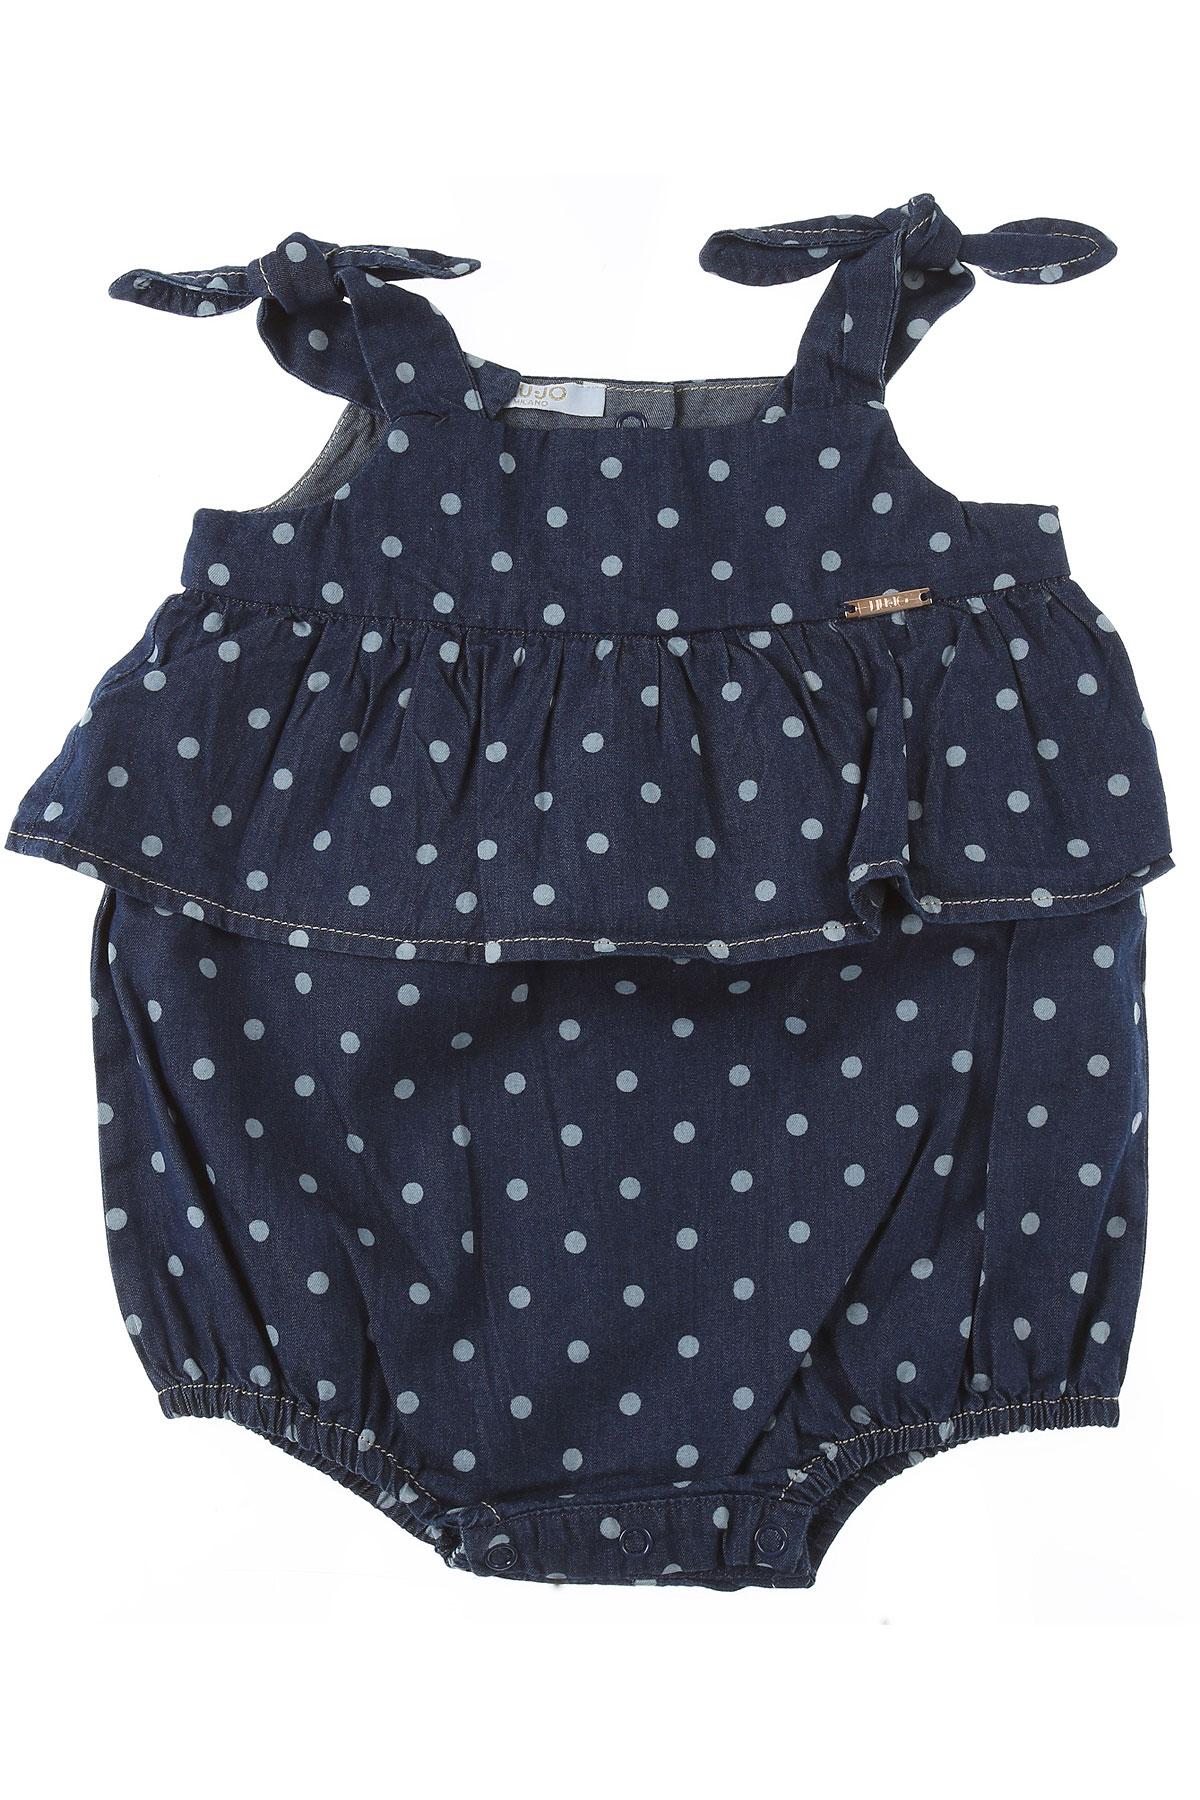 Liu Jo Baby Bodysuits & Onesies for Girls On Sale, Blue Denim, Cotton, 2019, 12M 18M 3M 6M